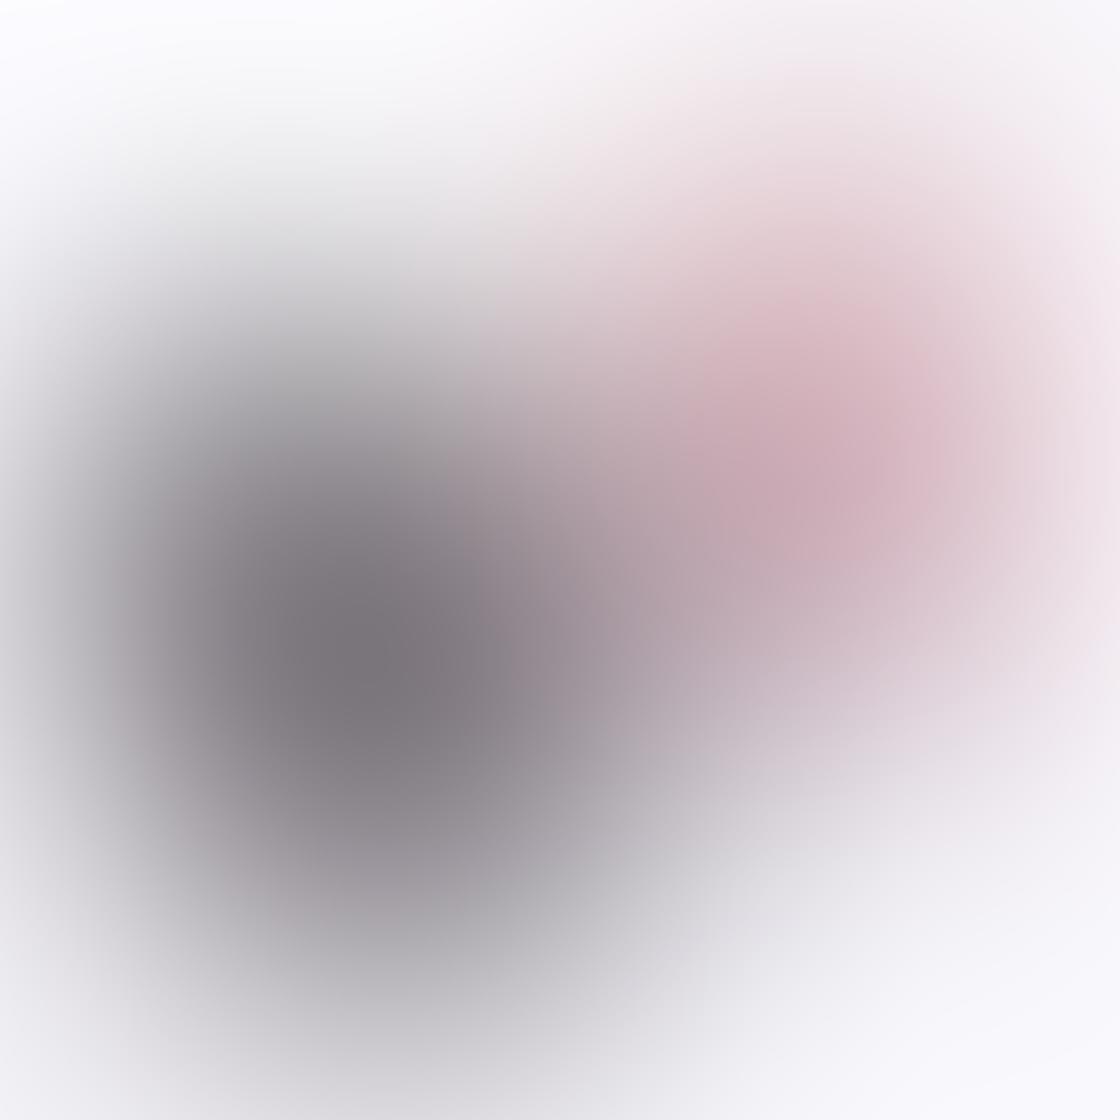 iPhone Photography Snow 107